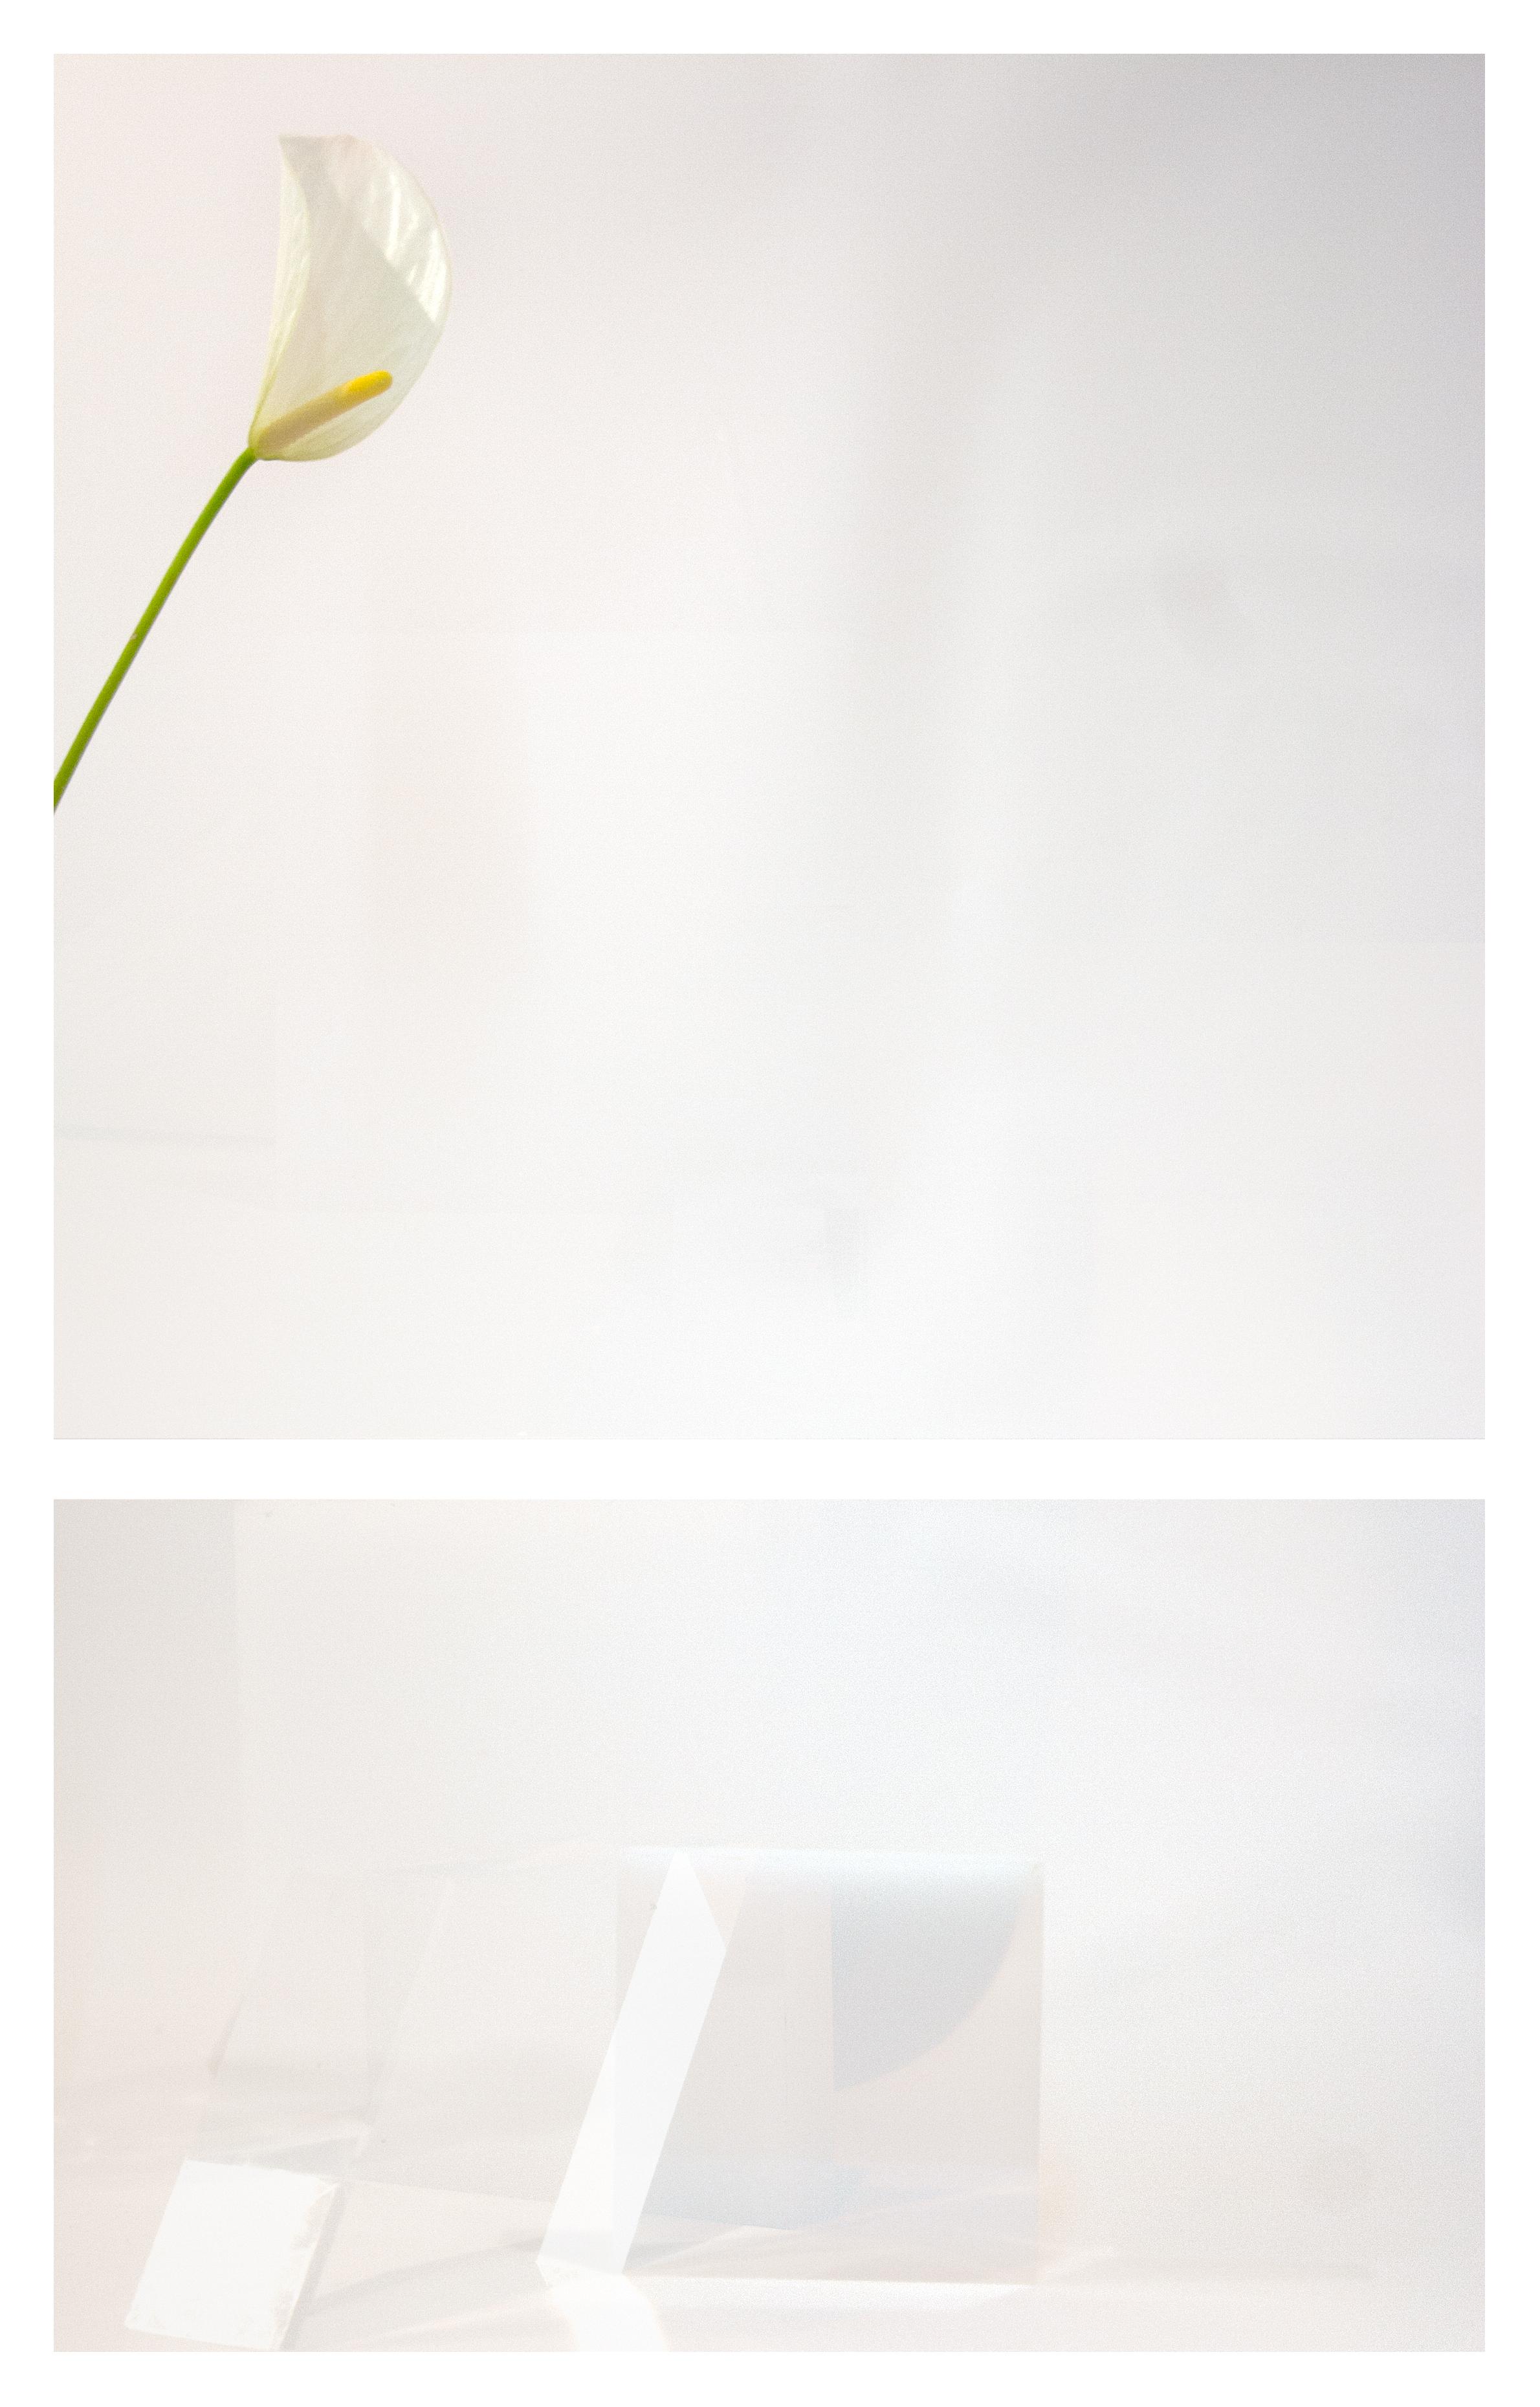 "Calla Lily Sun   Archival inkjet print  8"" x 12 1/2""  2017"